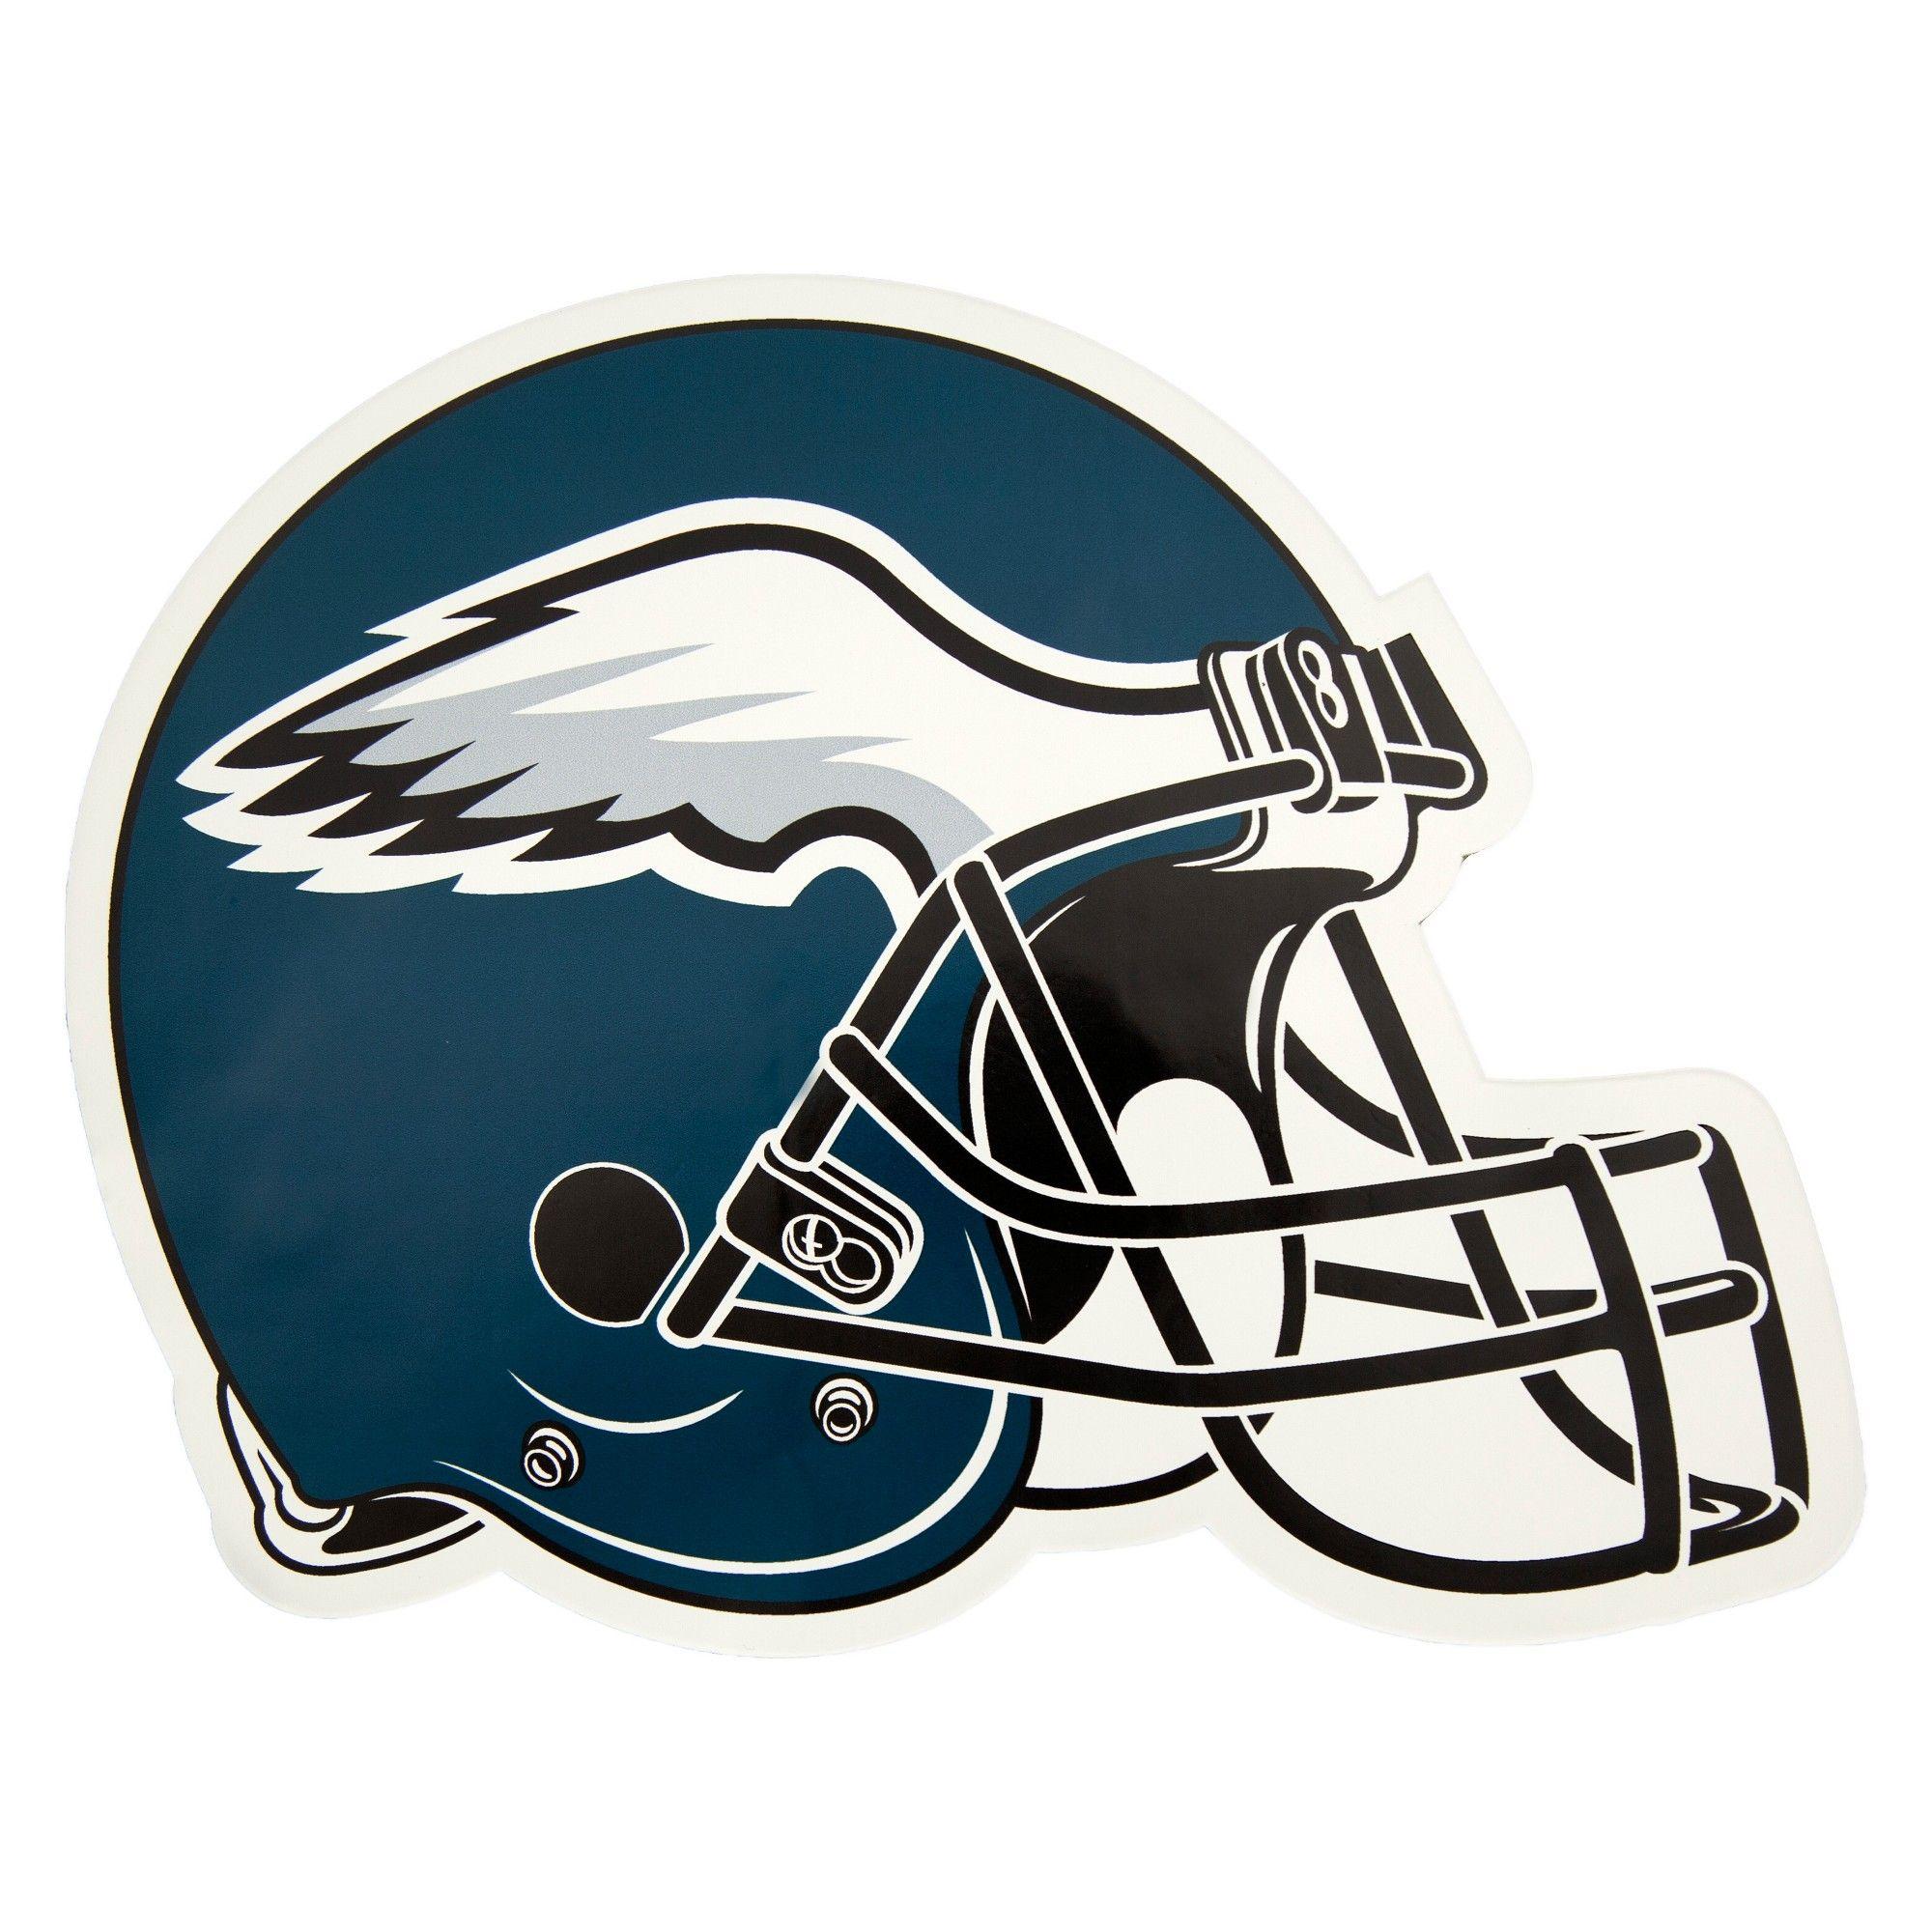 NFL Philadelphia Eagles Small Outdoor Helmet Decal  226b14bff